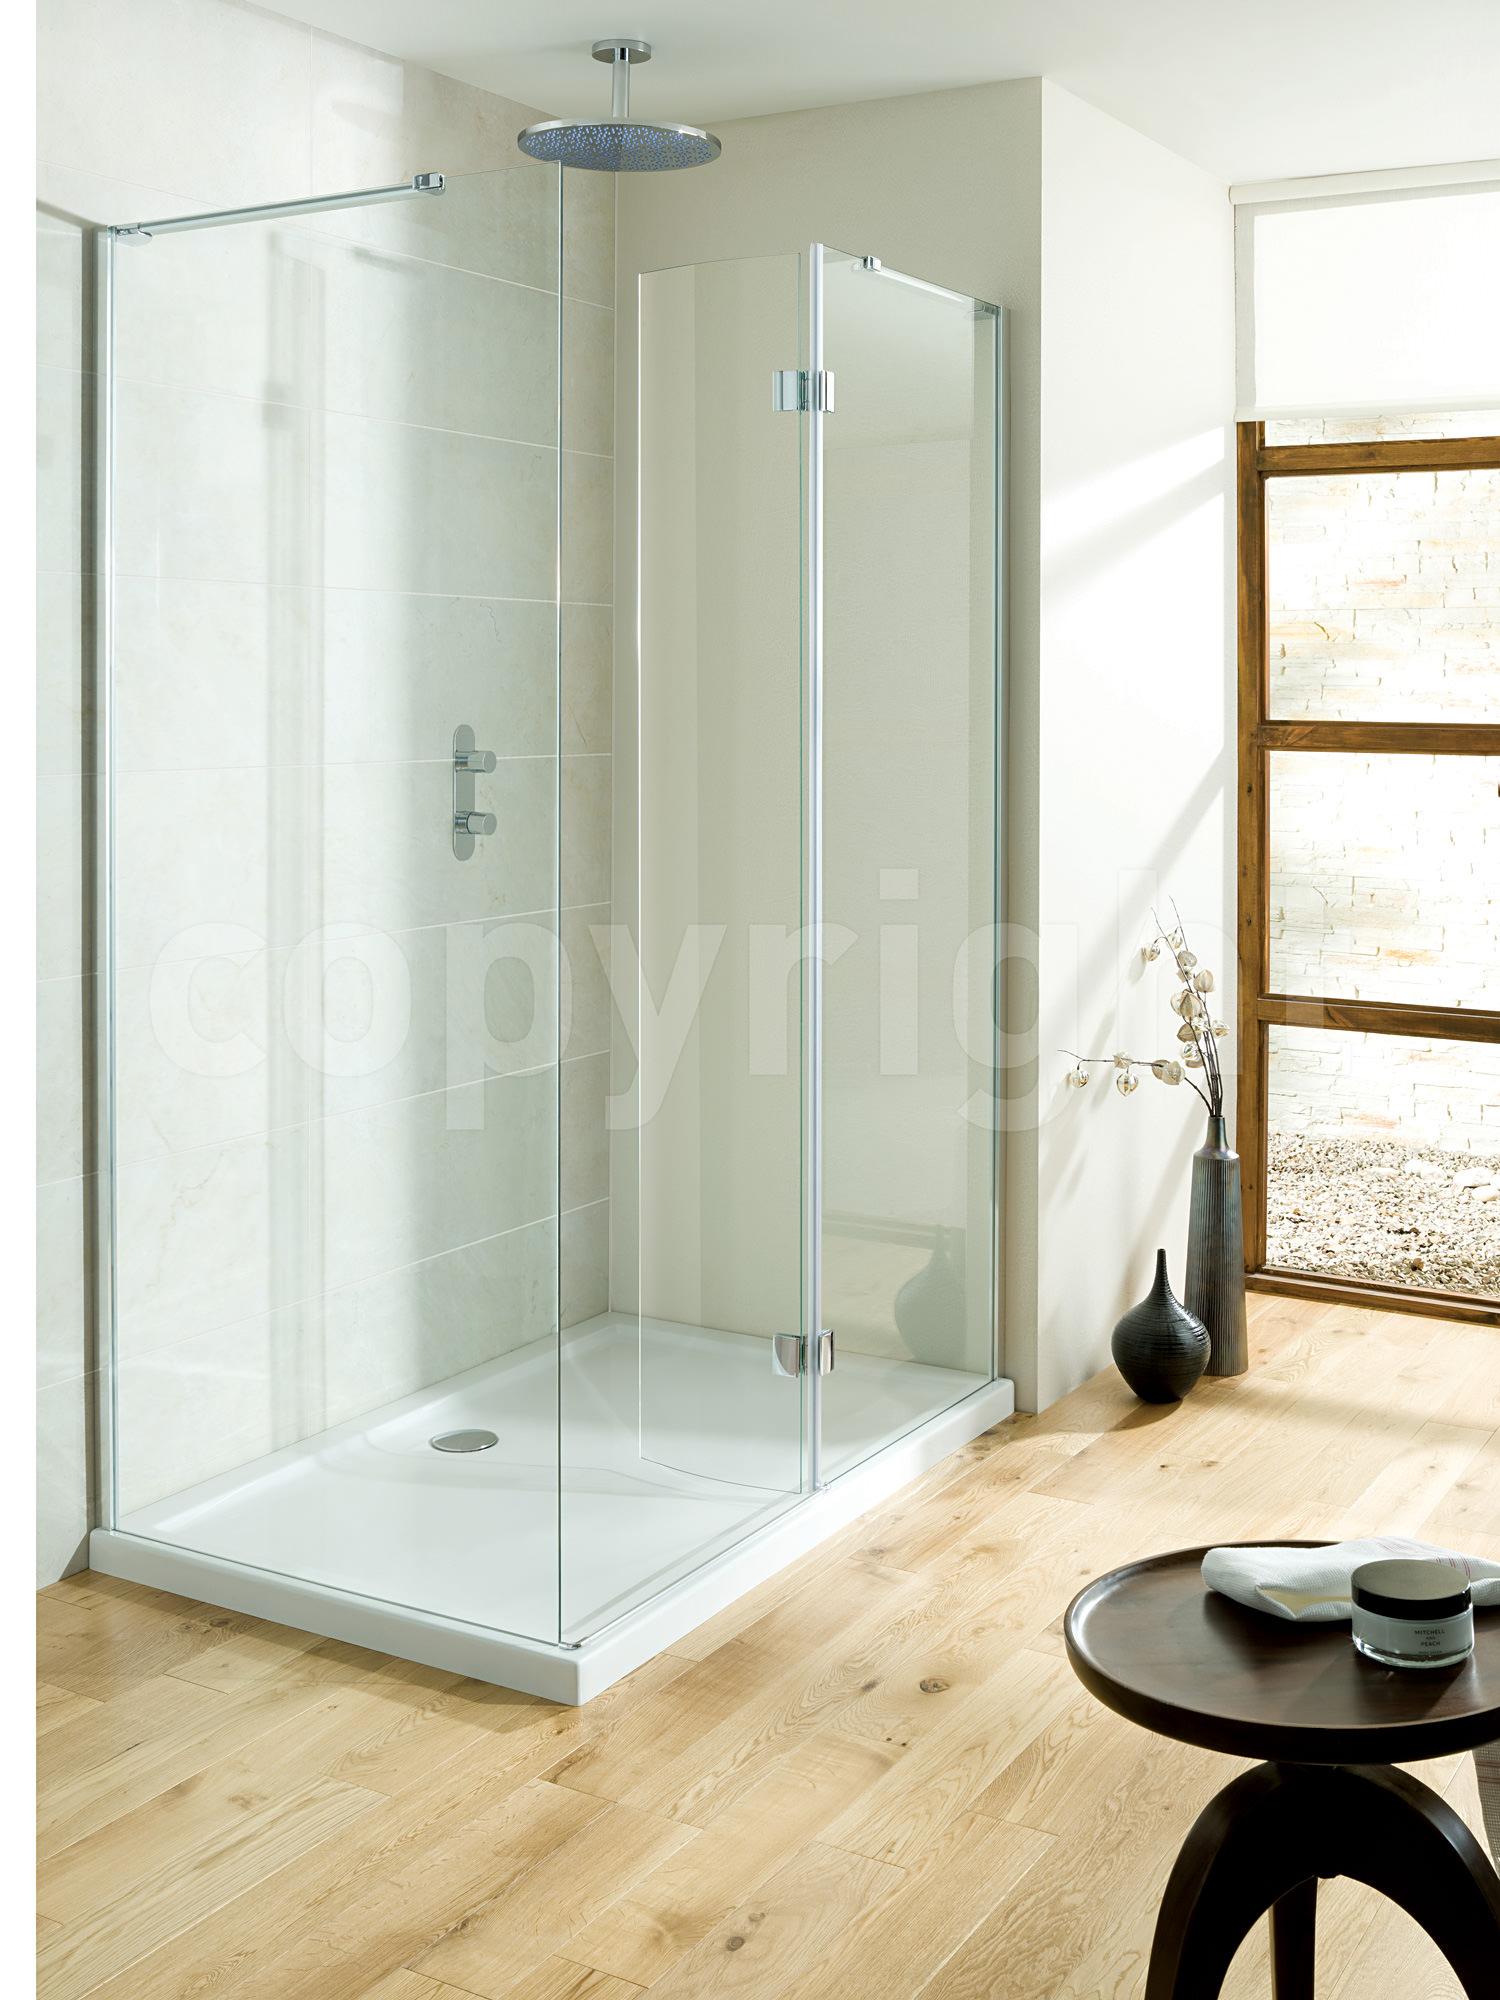 Walk In Shower Enclosure Simpsons Design View 1700mm Walk In Easy Access Shower Enclosure